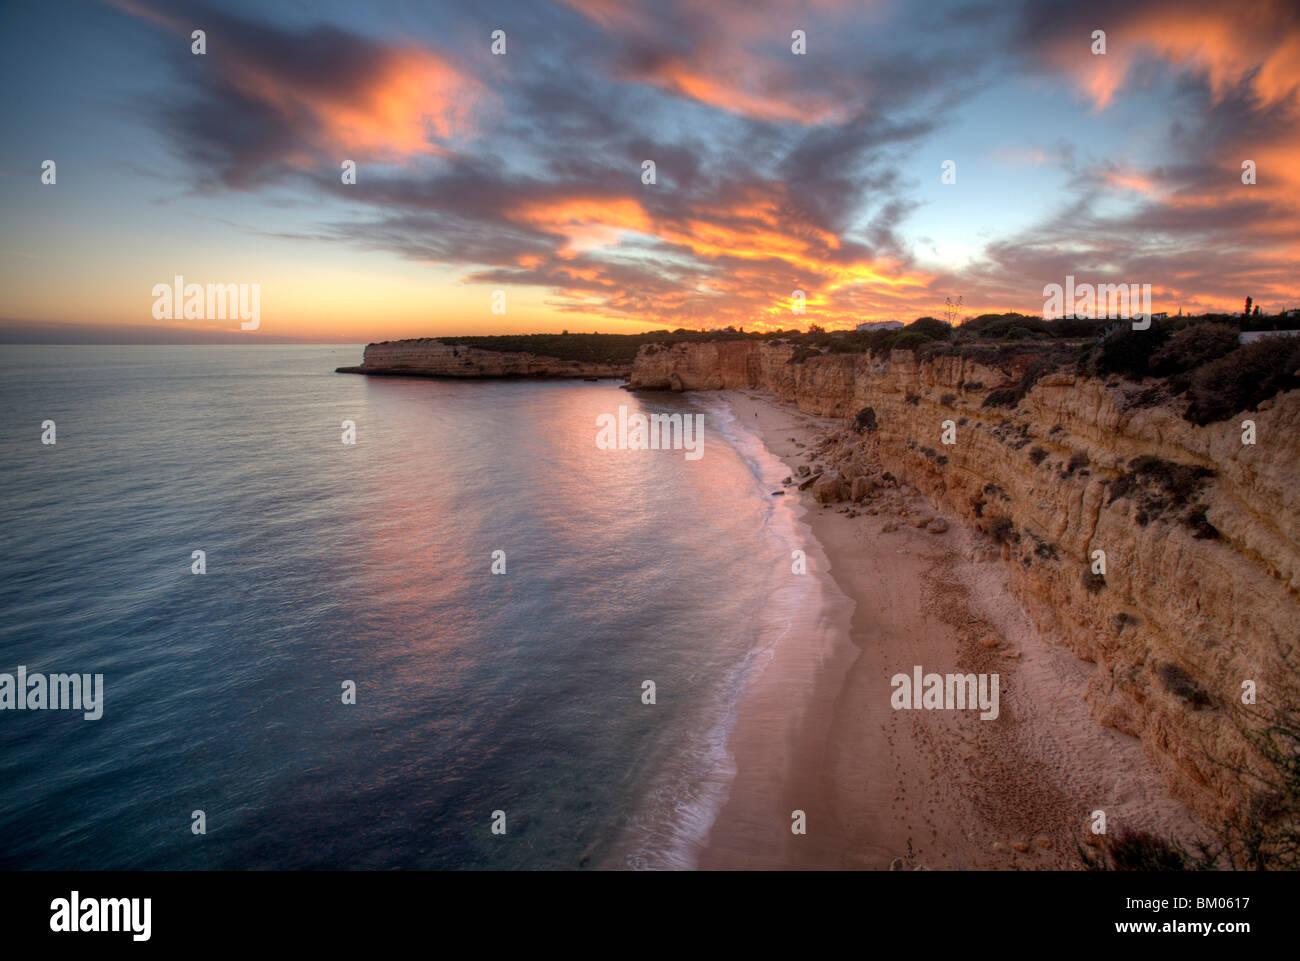 town of Porches, municipality of Lagoa, district of Faro, region of Algarve, Portugal - Stock Image